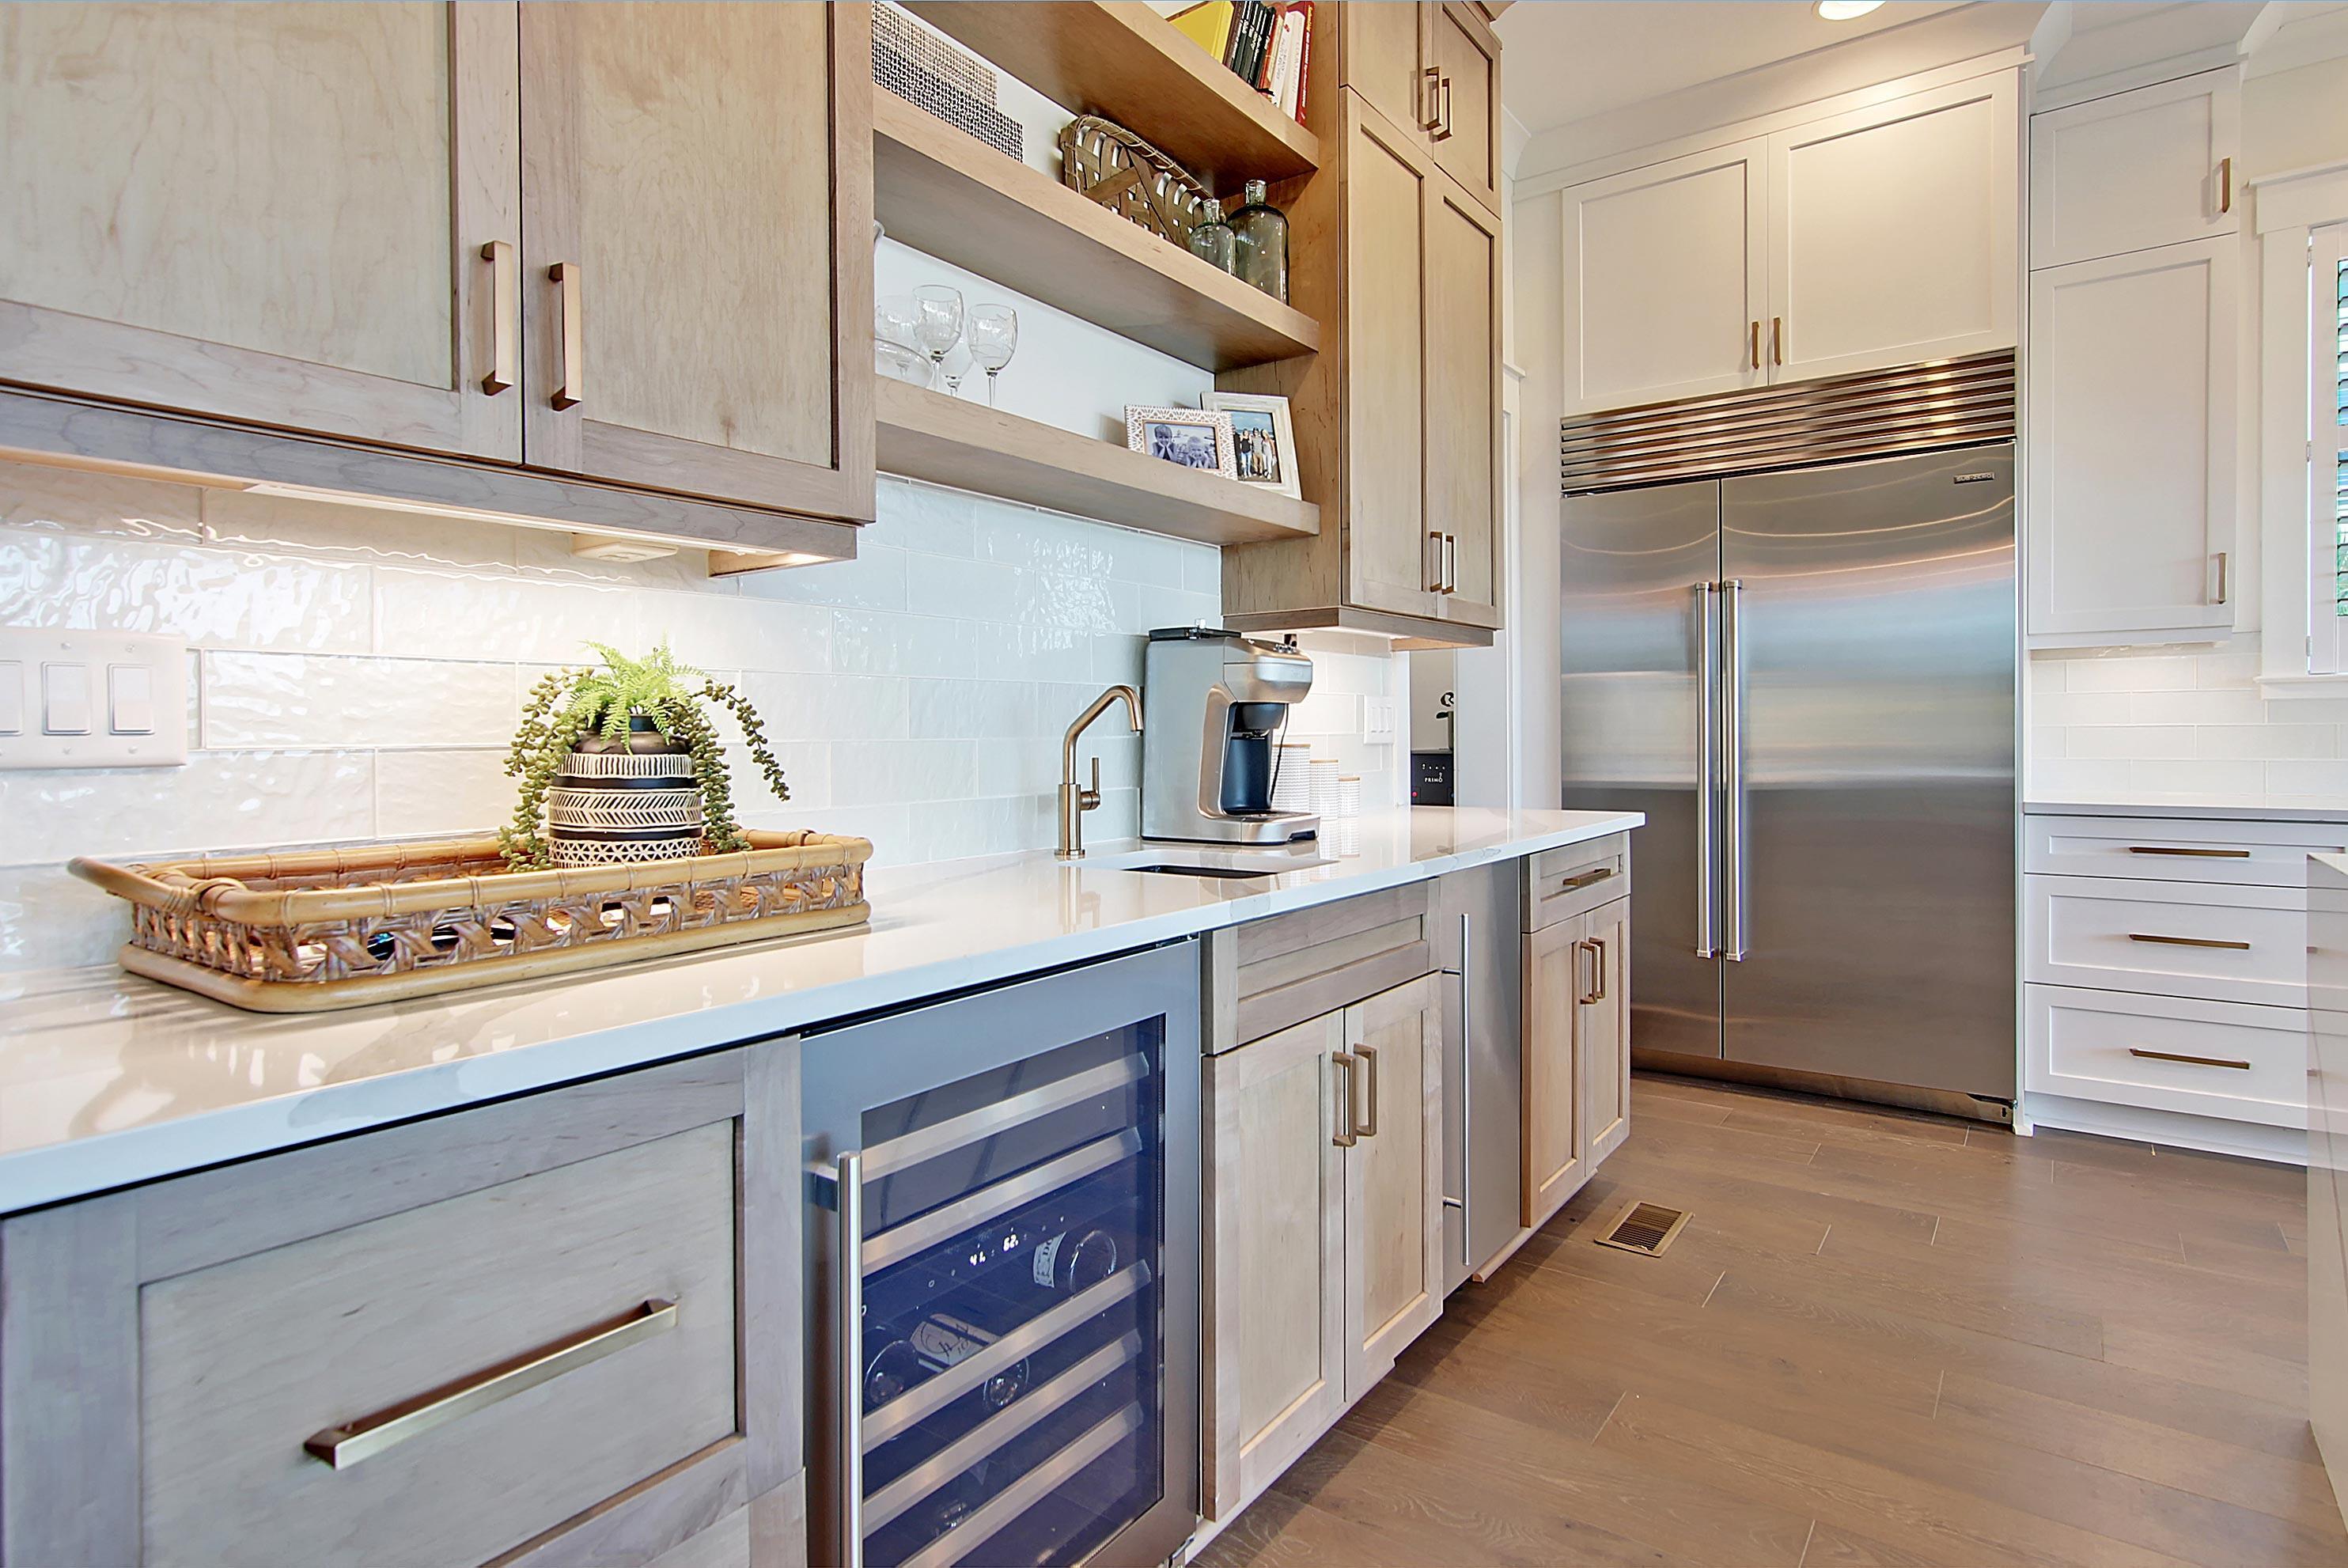 Dunes West Homes For Sale - 2456 Darts Cove, Mount Pleasant, SC - 48